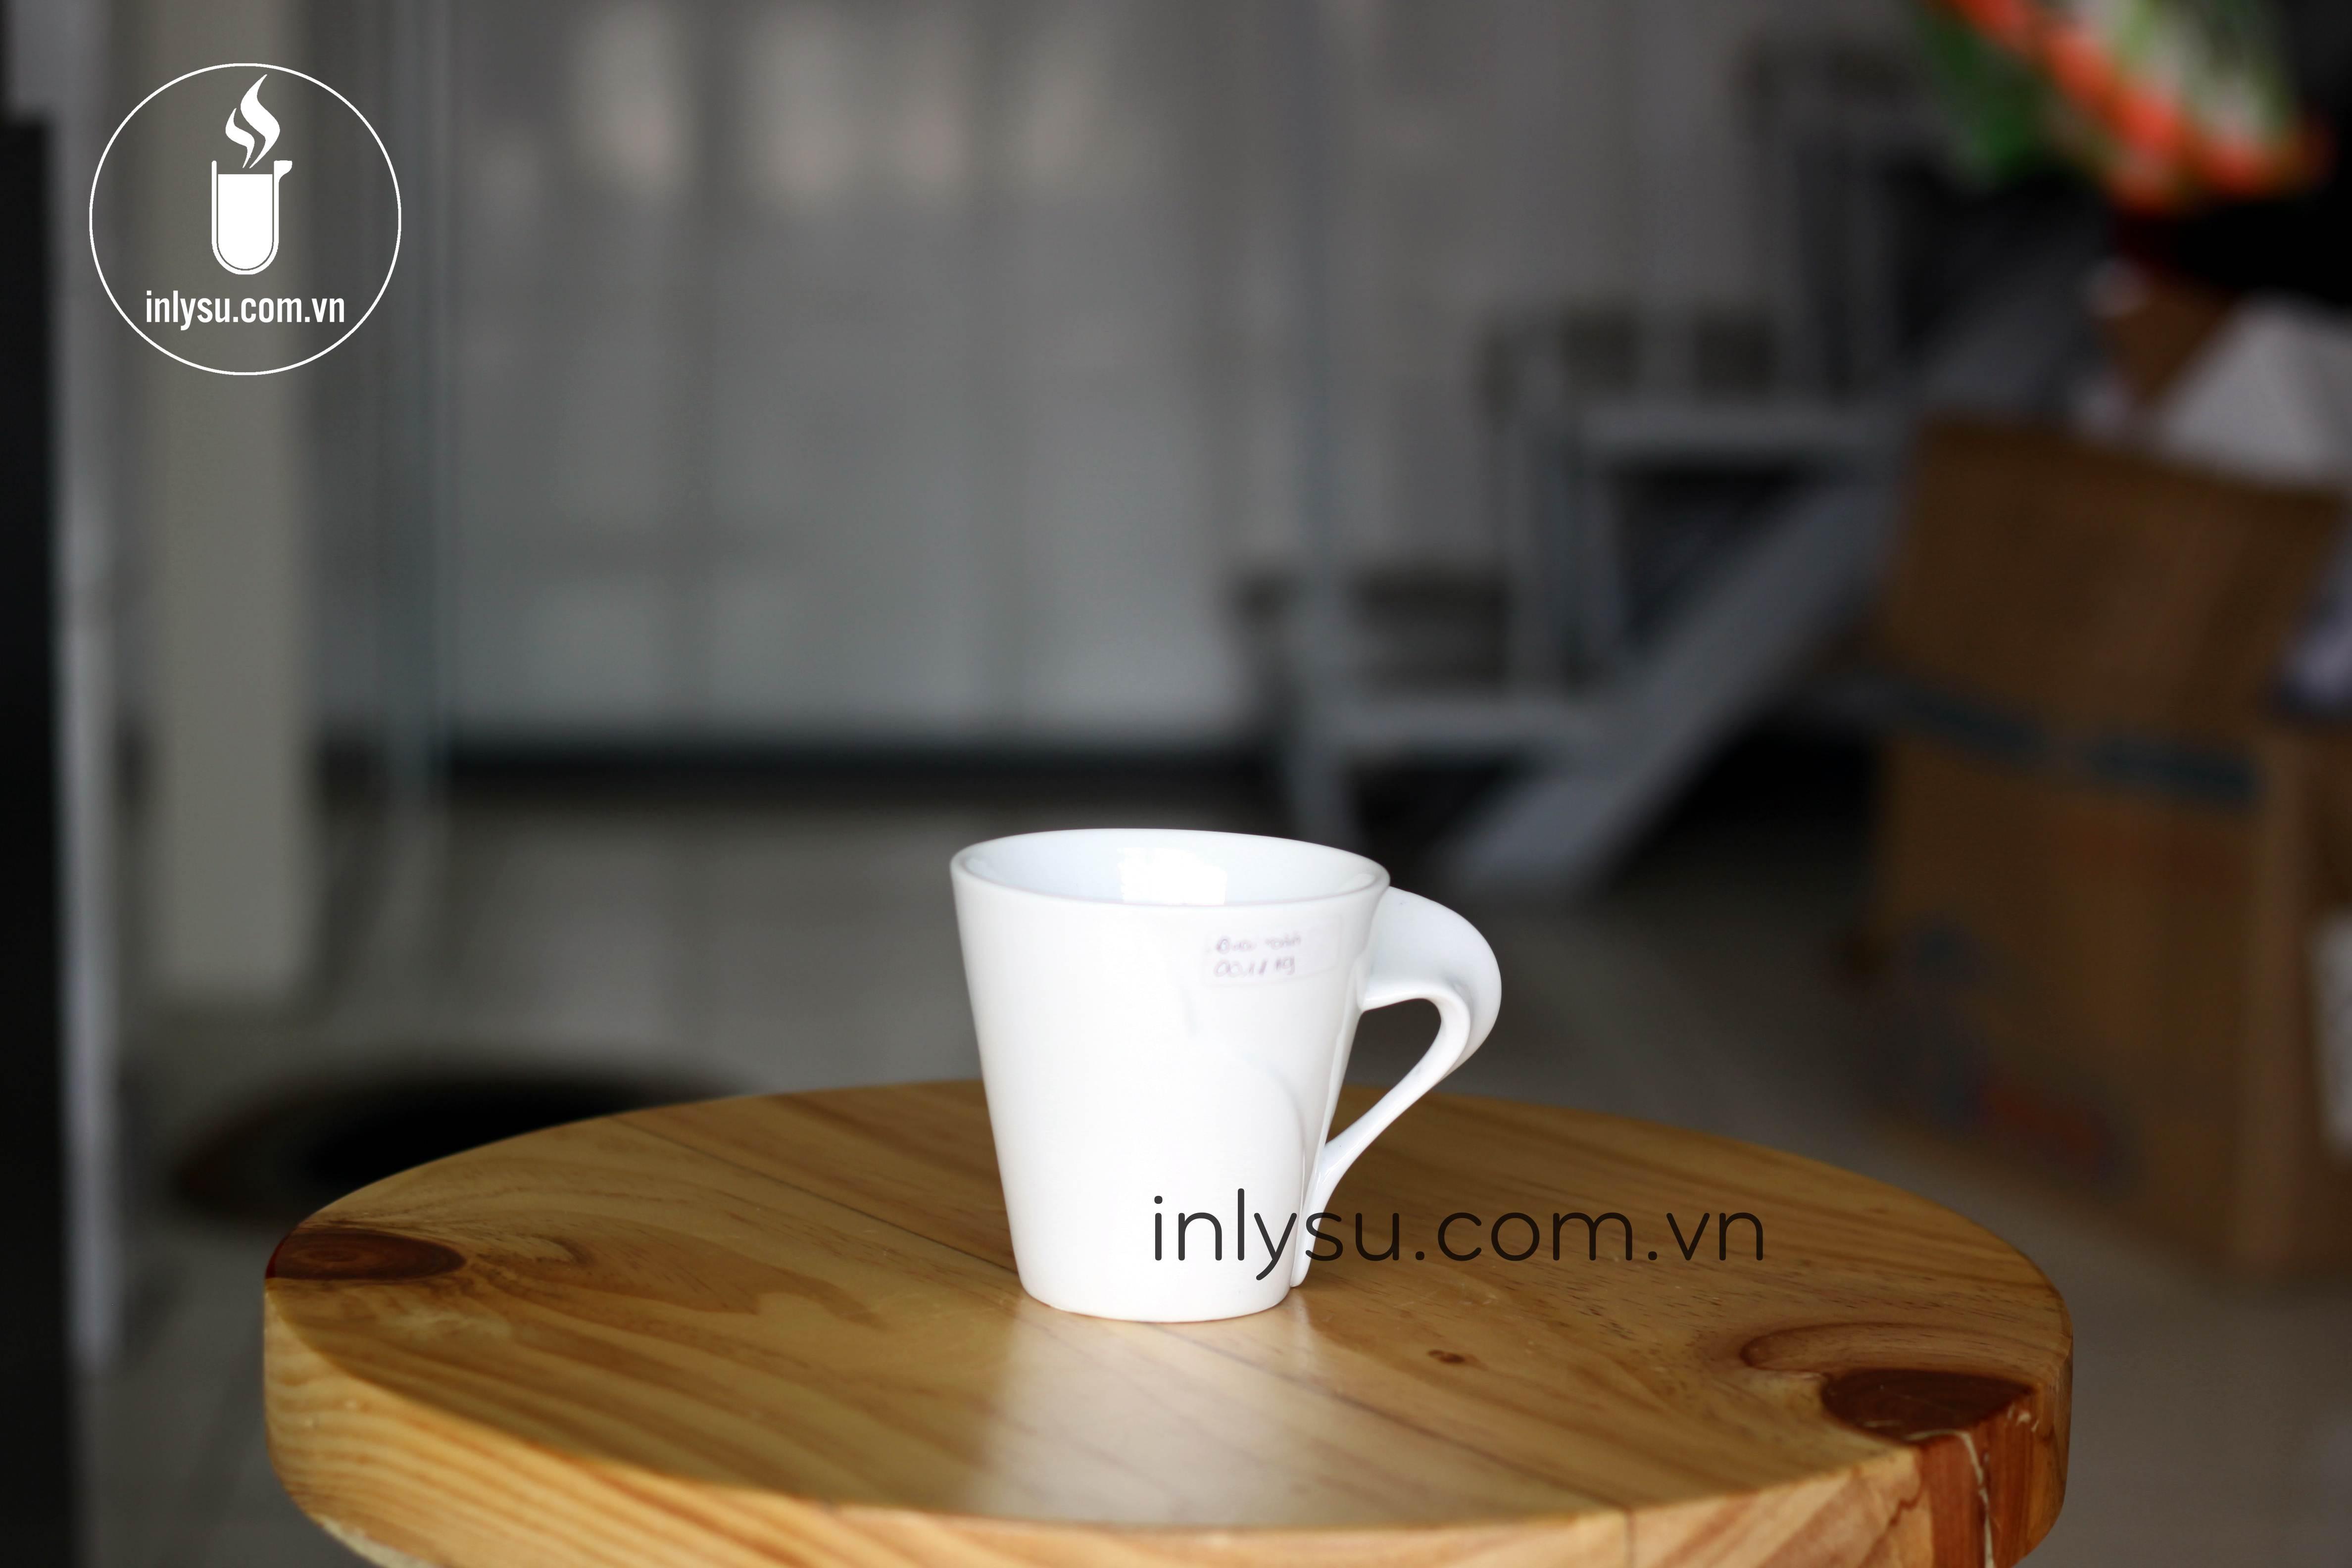 in ly sứ giá rẻ hcm inlysu.com.vn